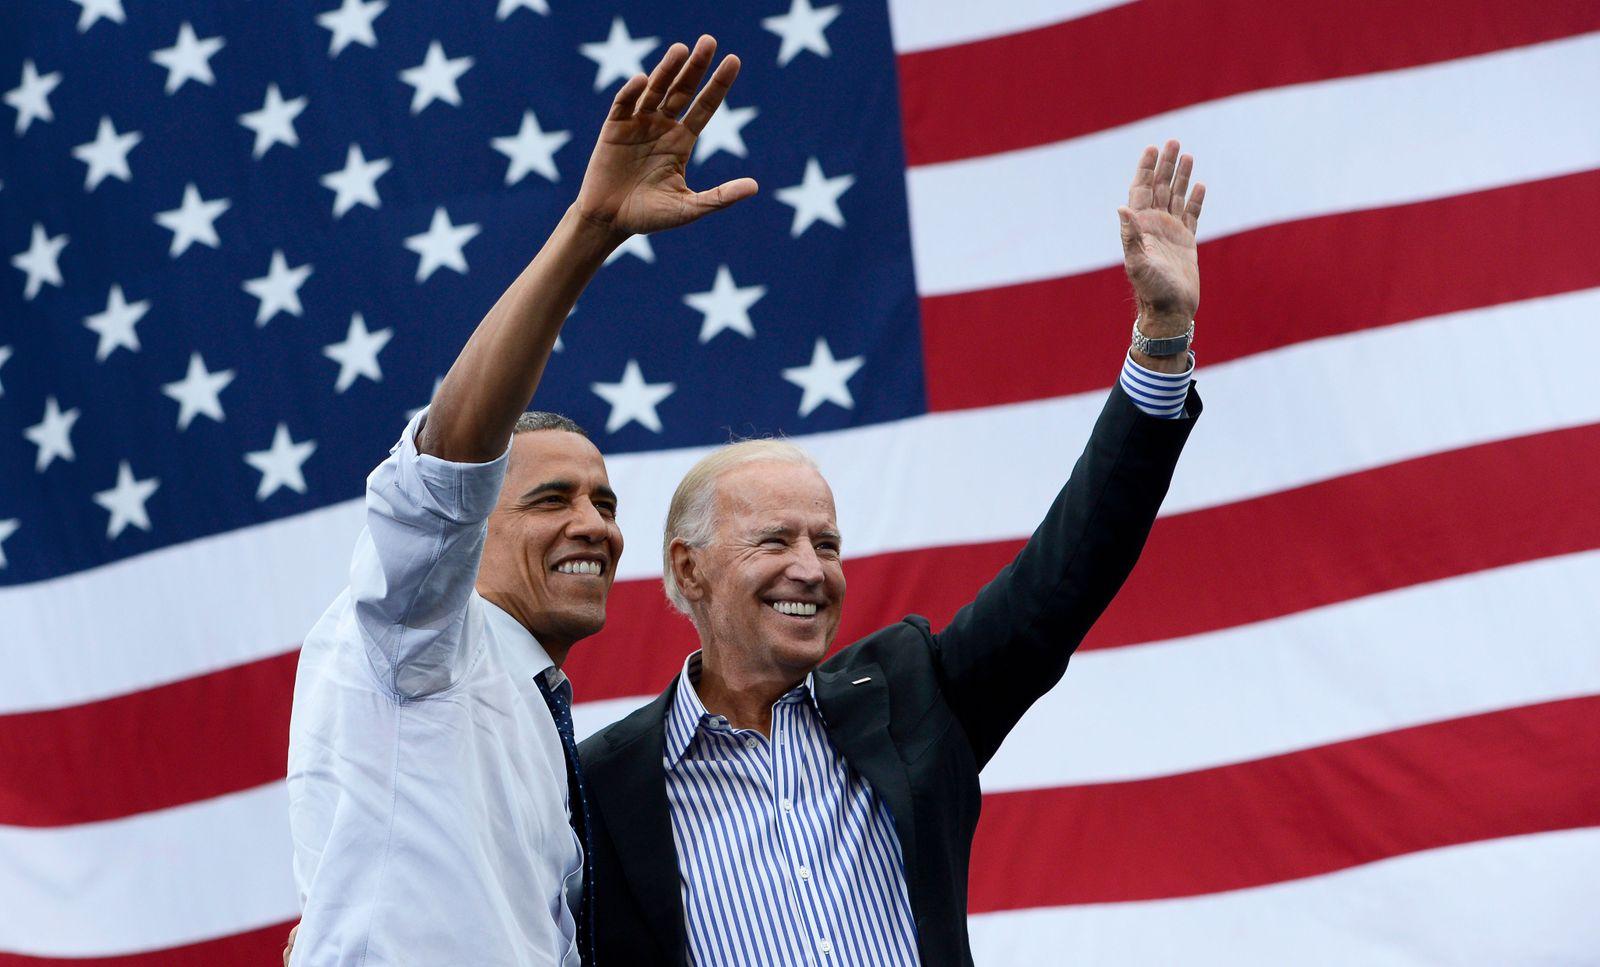 Barack Obama endorses Joe Biden for US presidential elections, Iowa City, USA - 07 Sep 2012